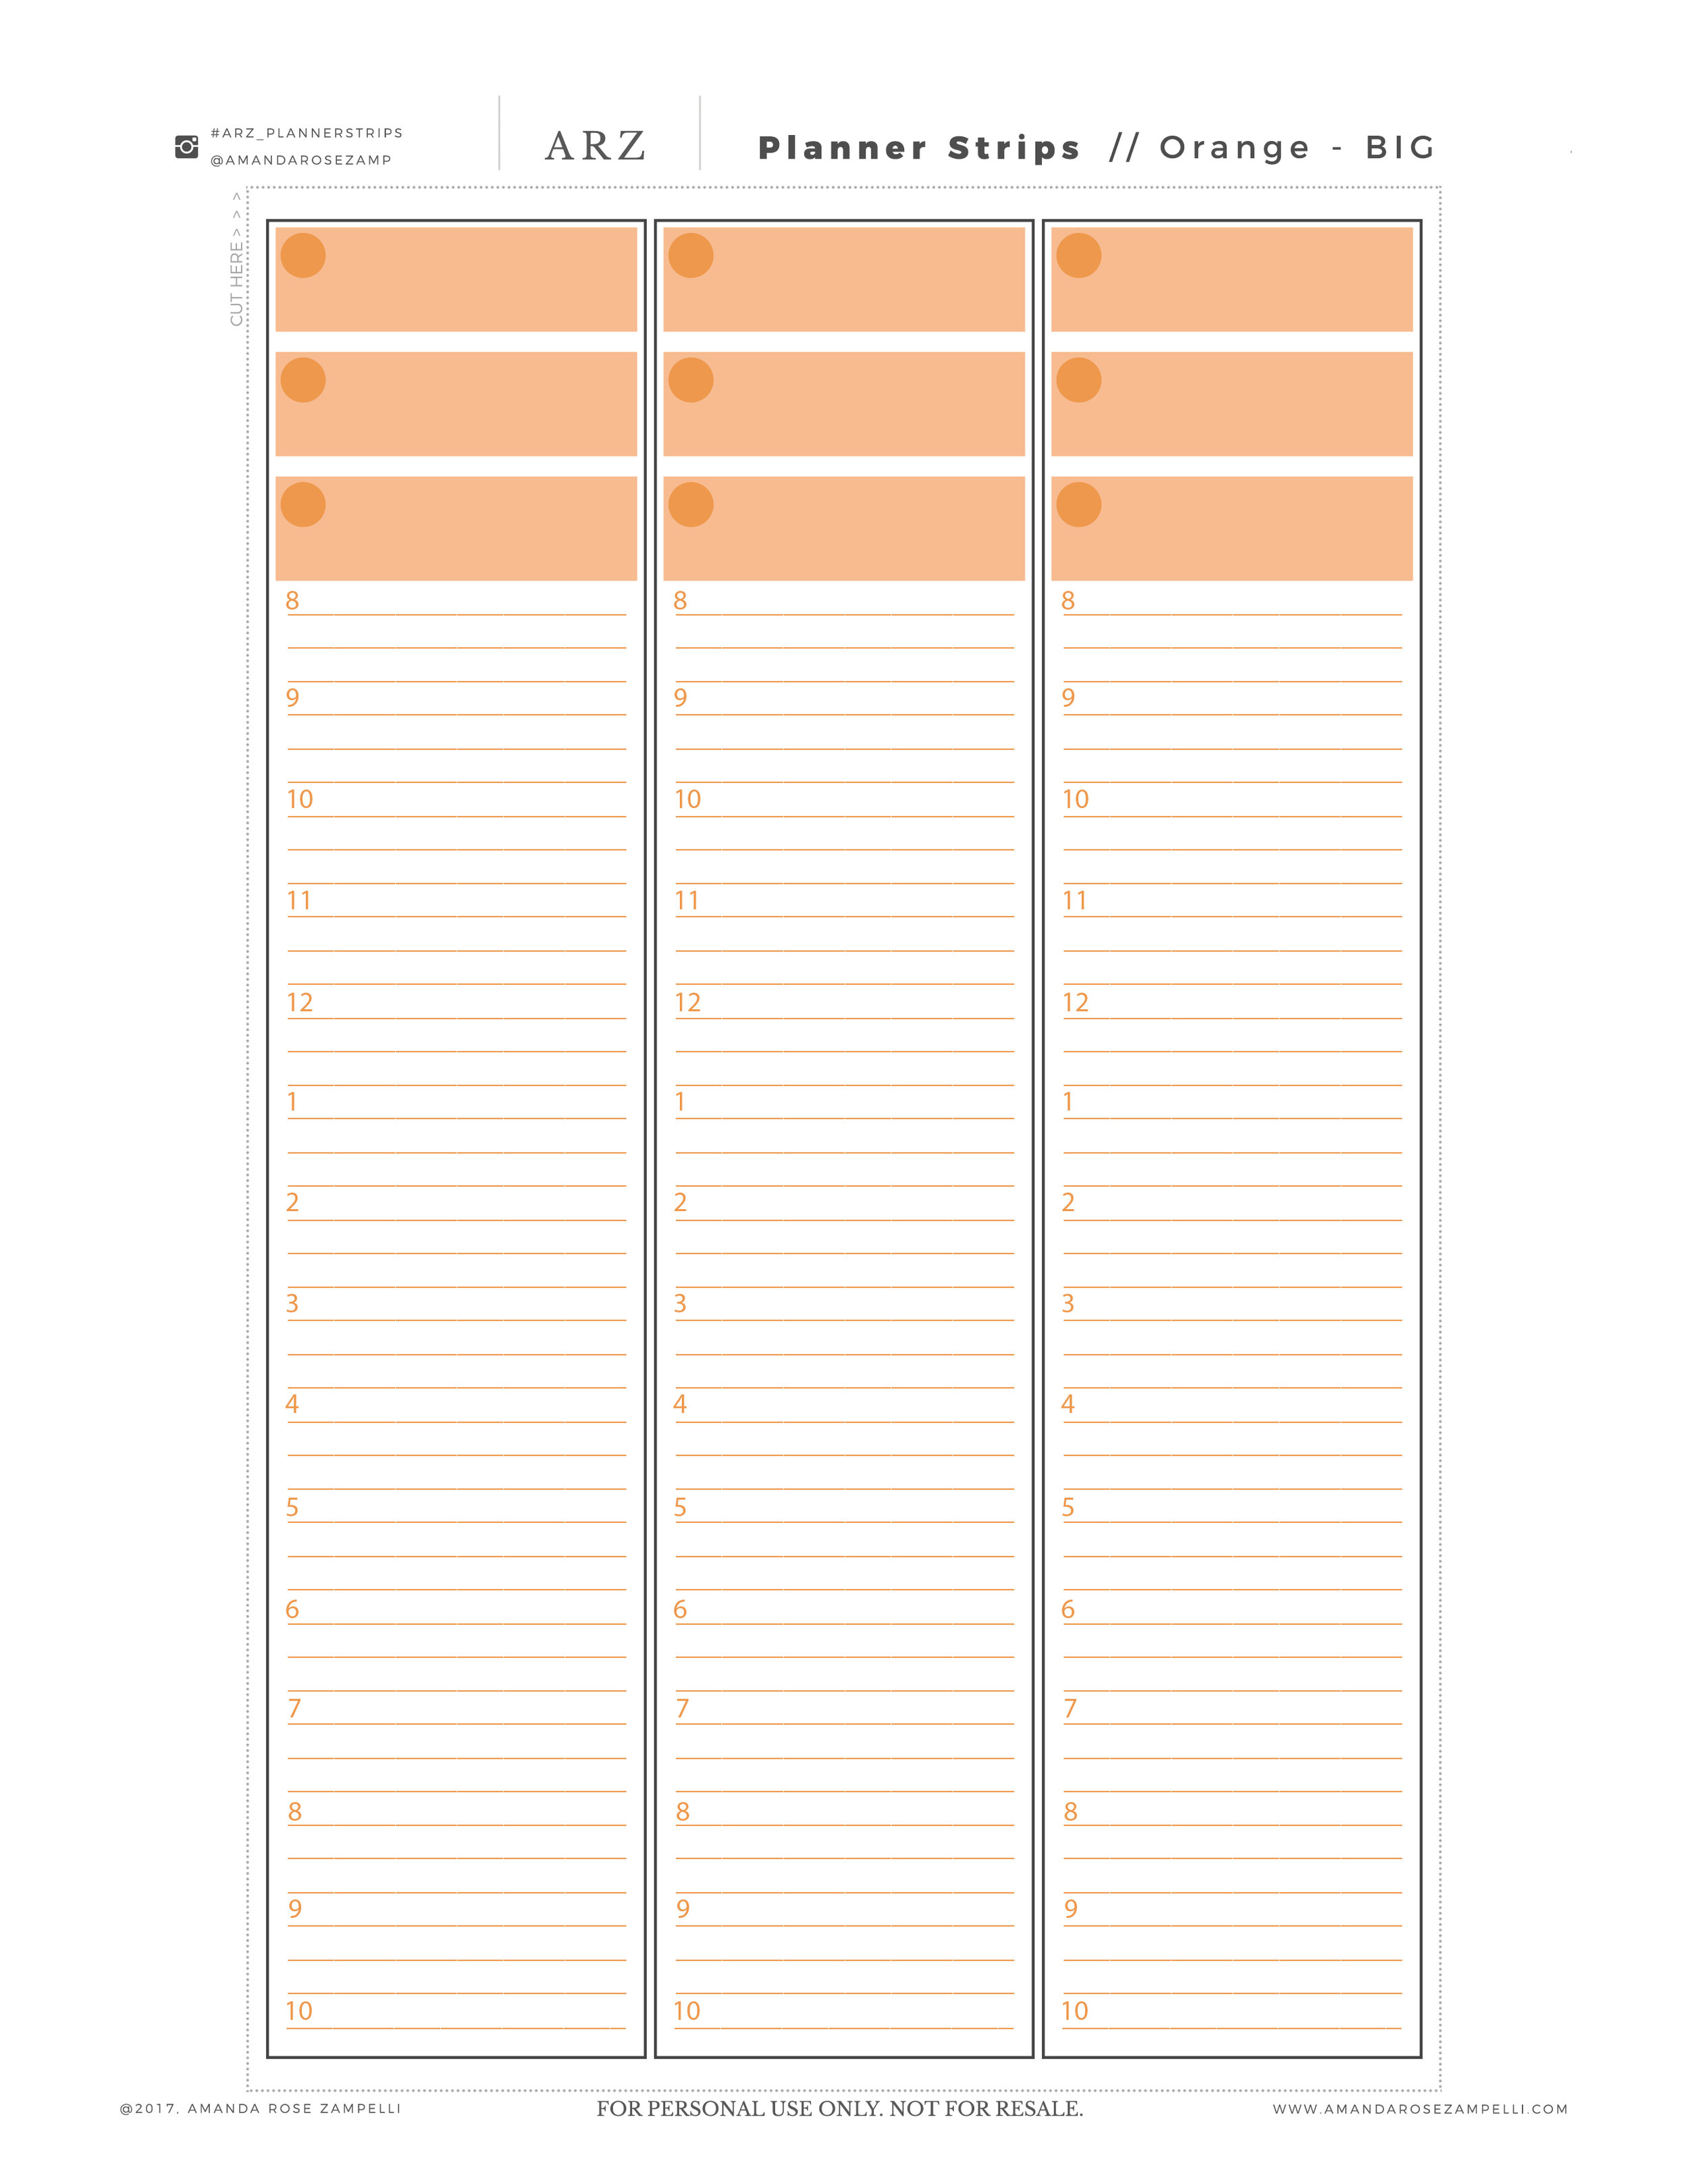 03 BIG orange M - W planner strips.jpg